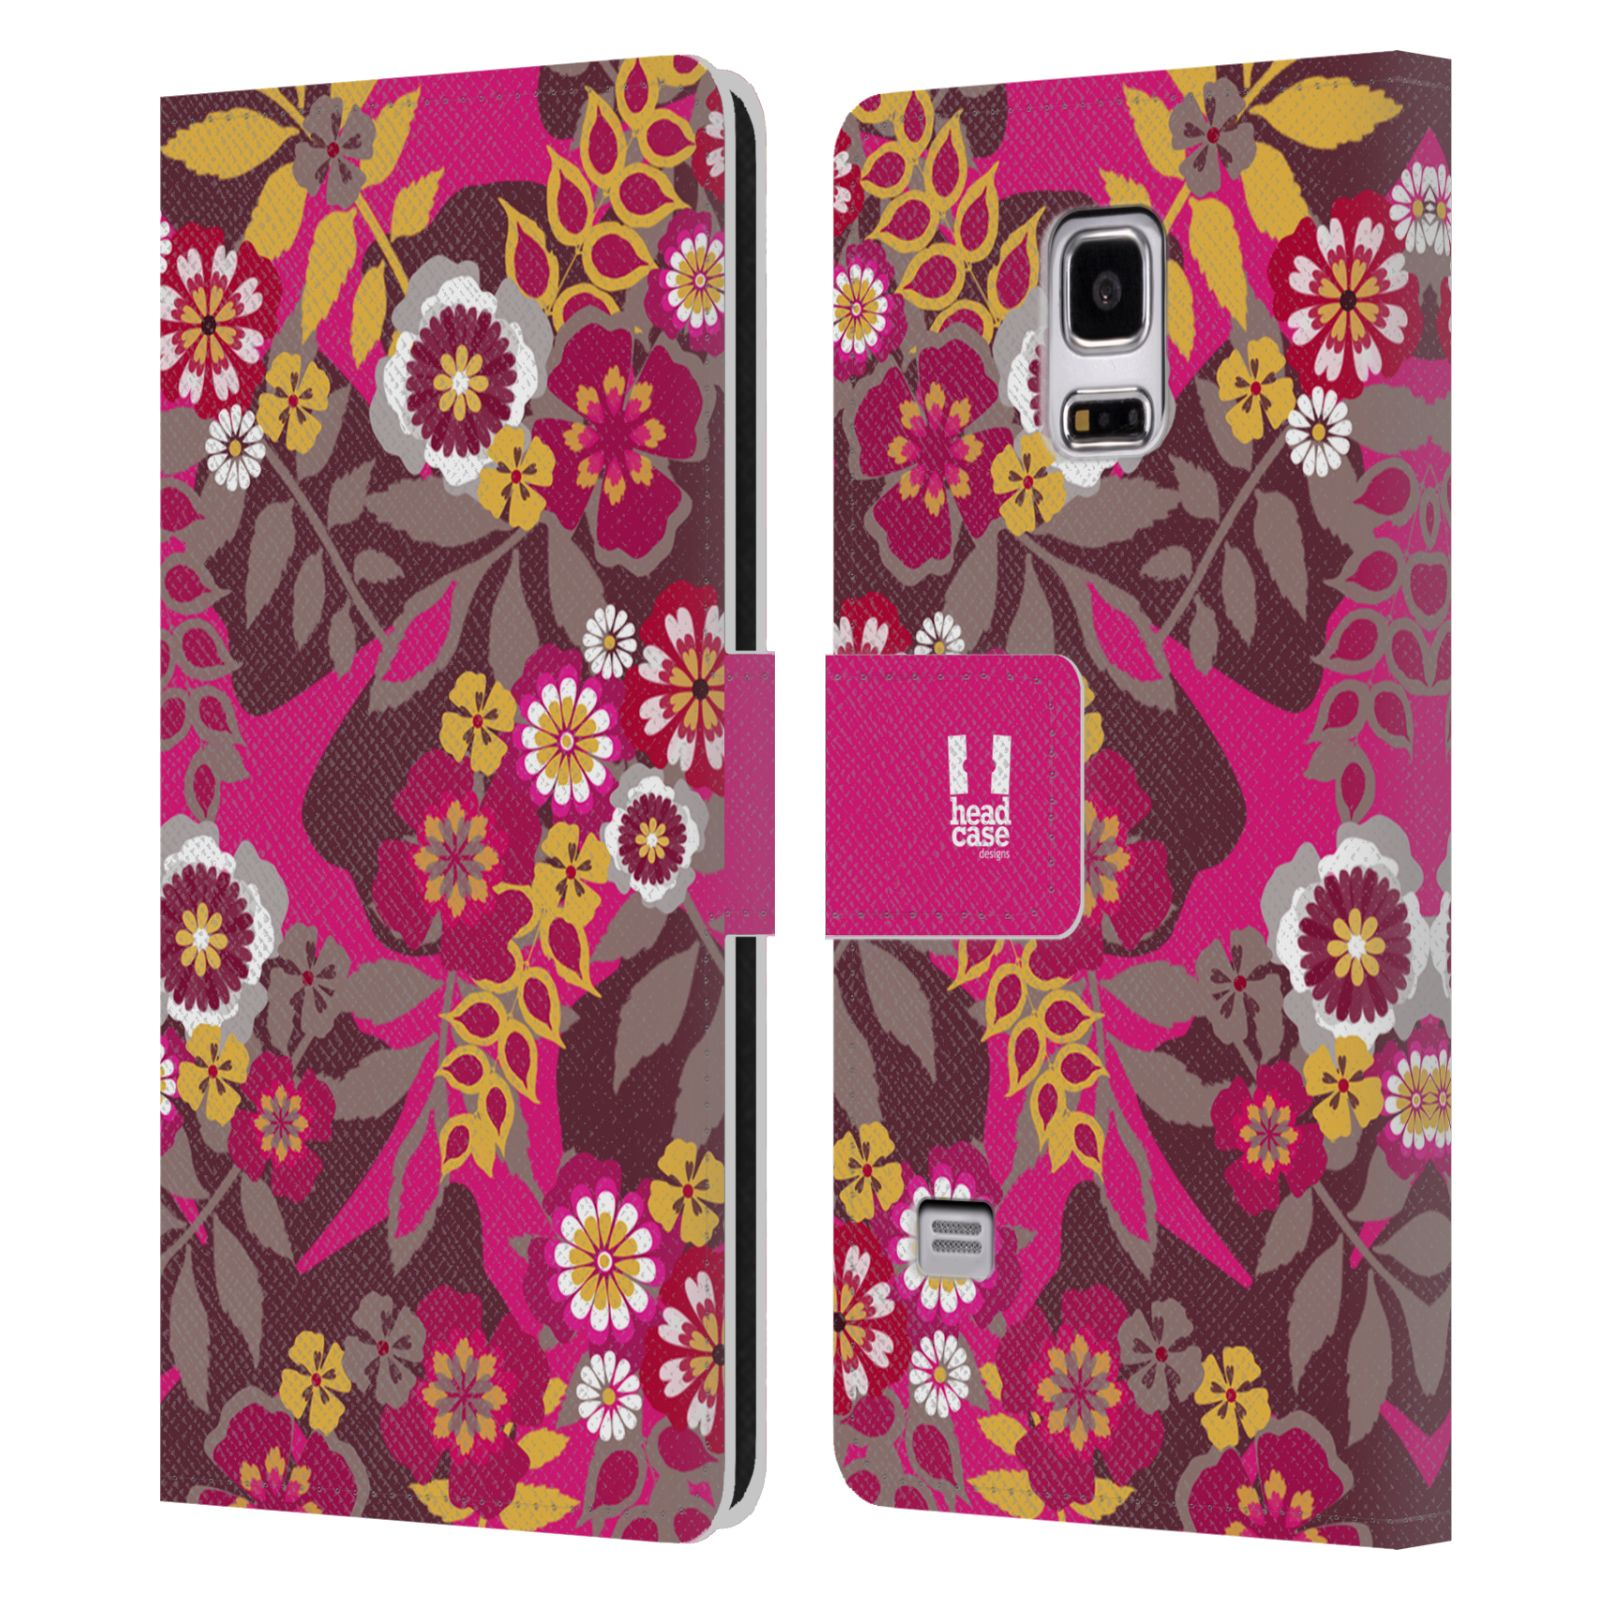 HEAD CASE Flipové pouzdro pro mobil Samsung Galaxy S5 MINI / S5 MINI DUOS BOTANIKA růžová a hnědá